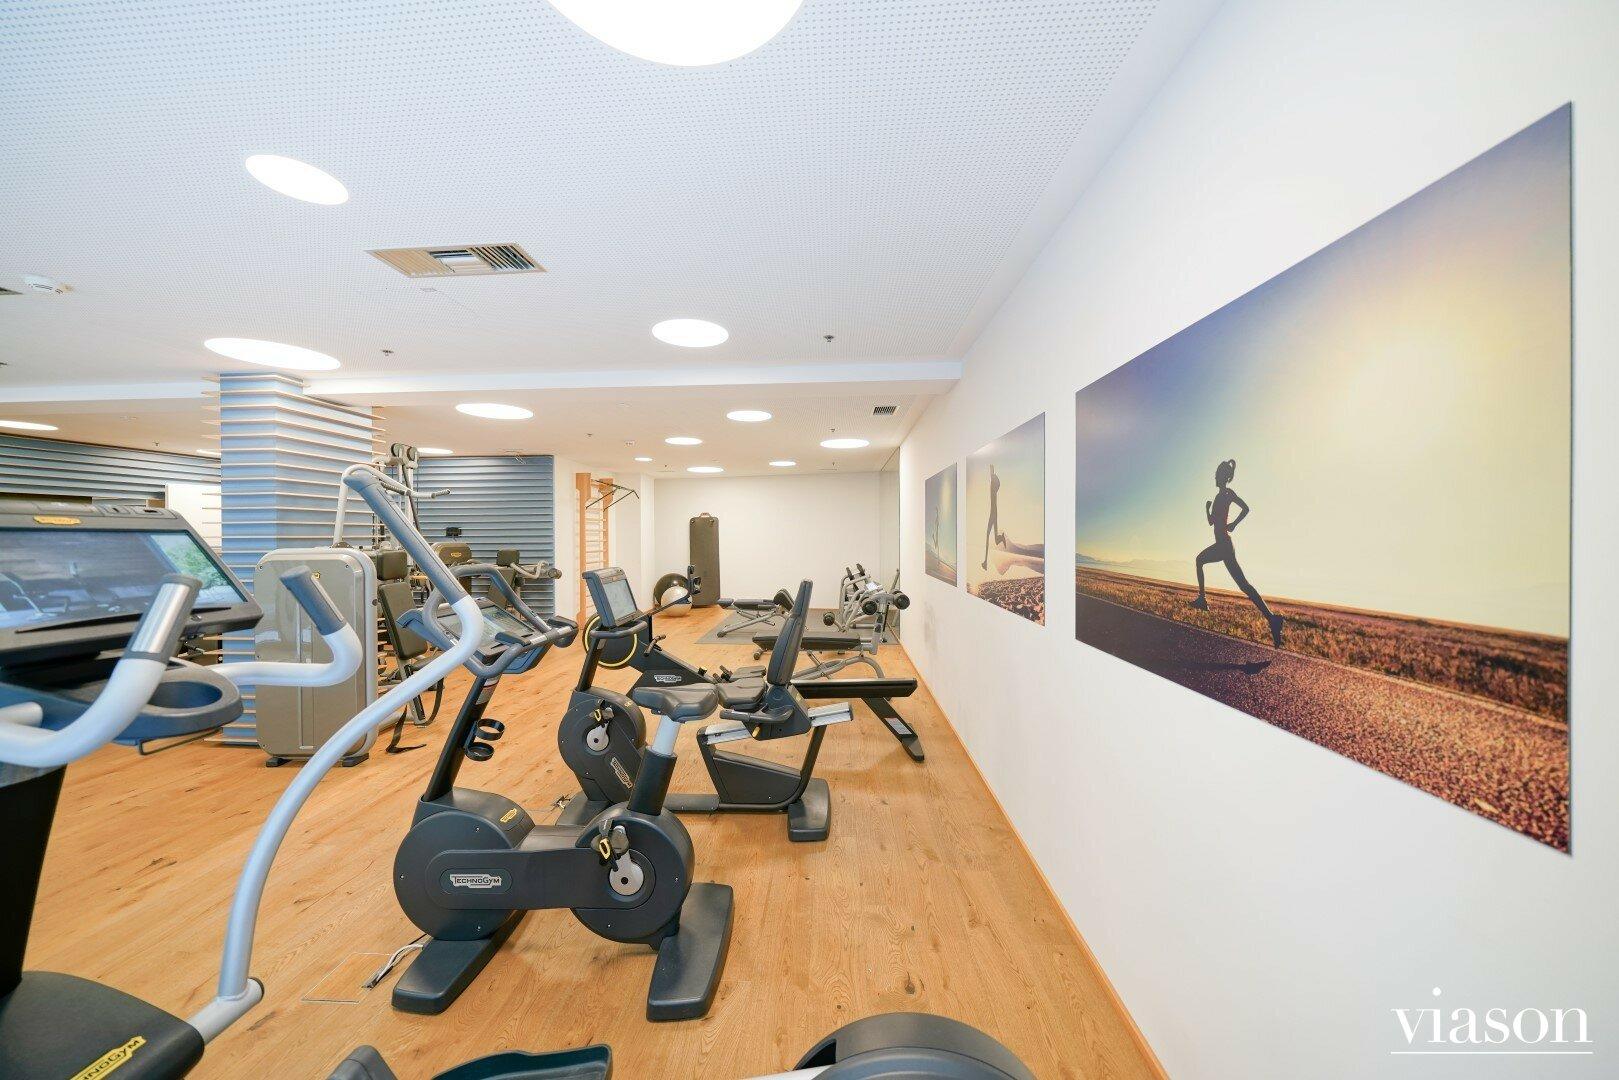 Fitnessraum im Haus